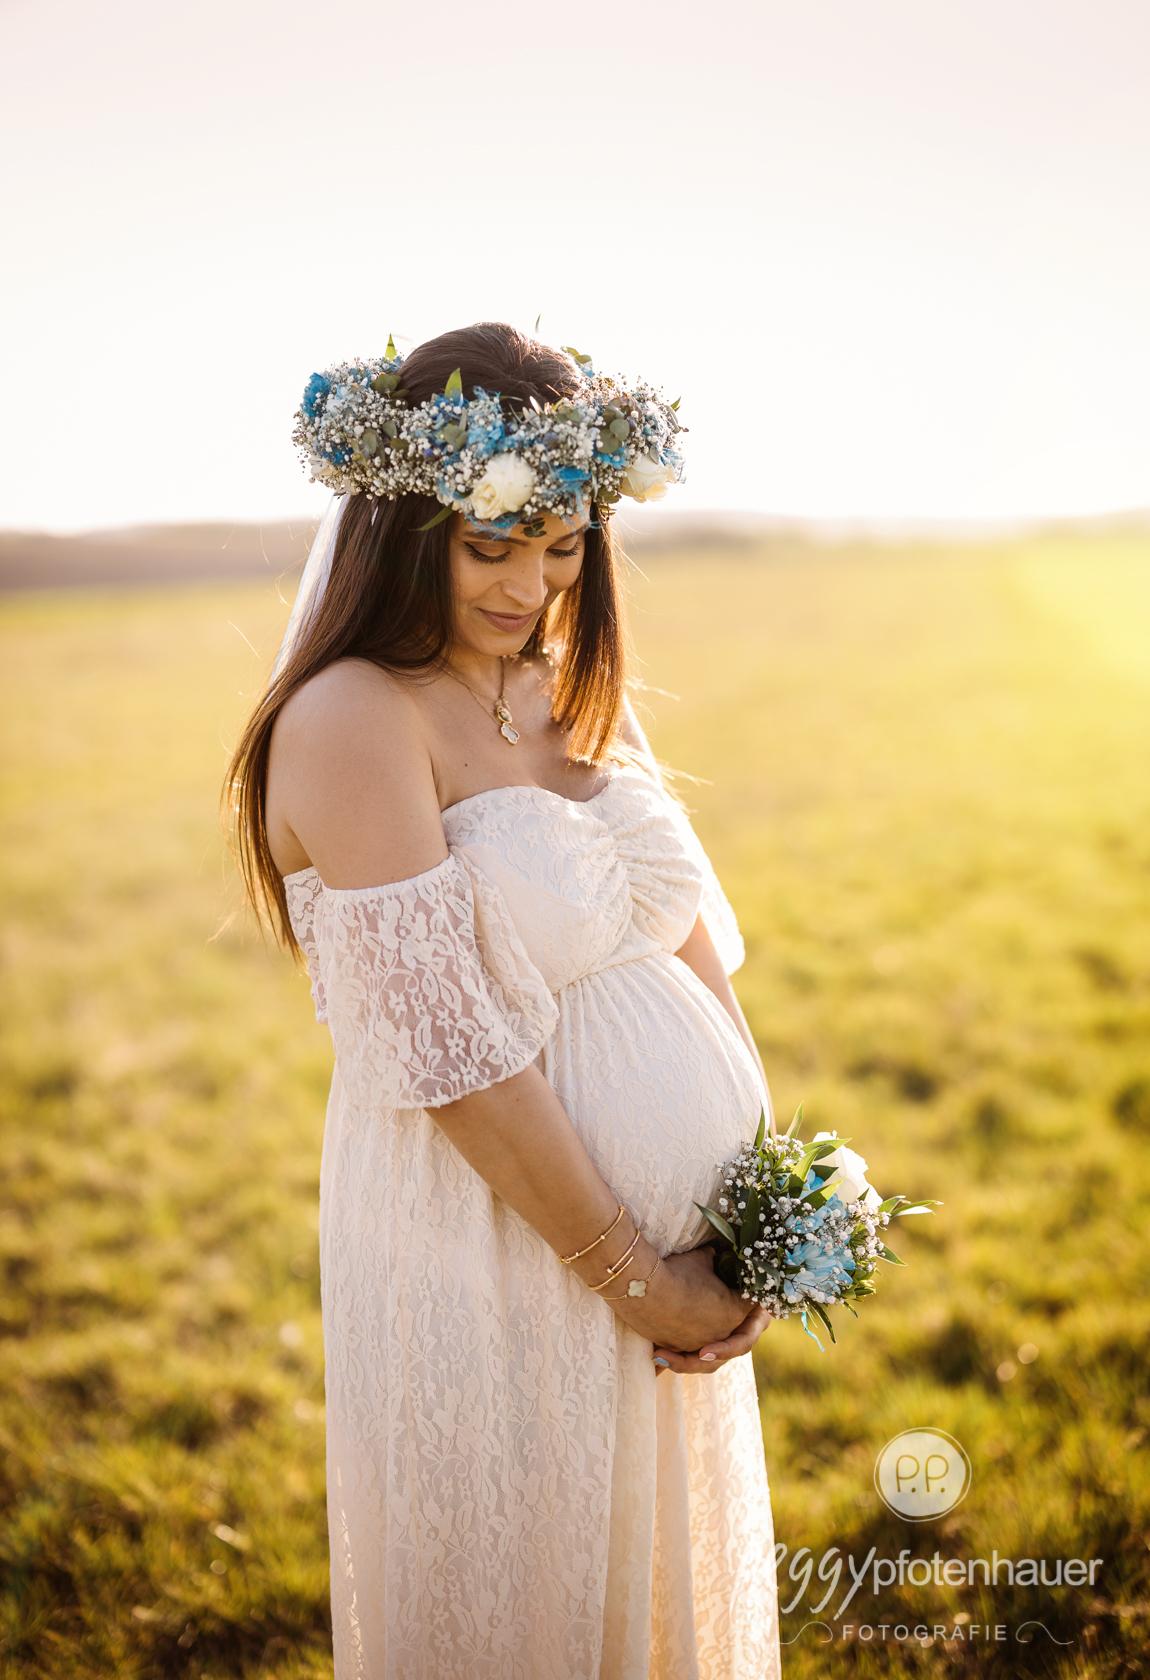 Babybauchbilder im Frühling